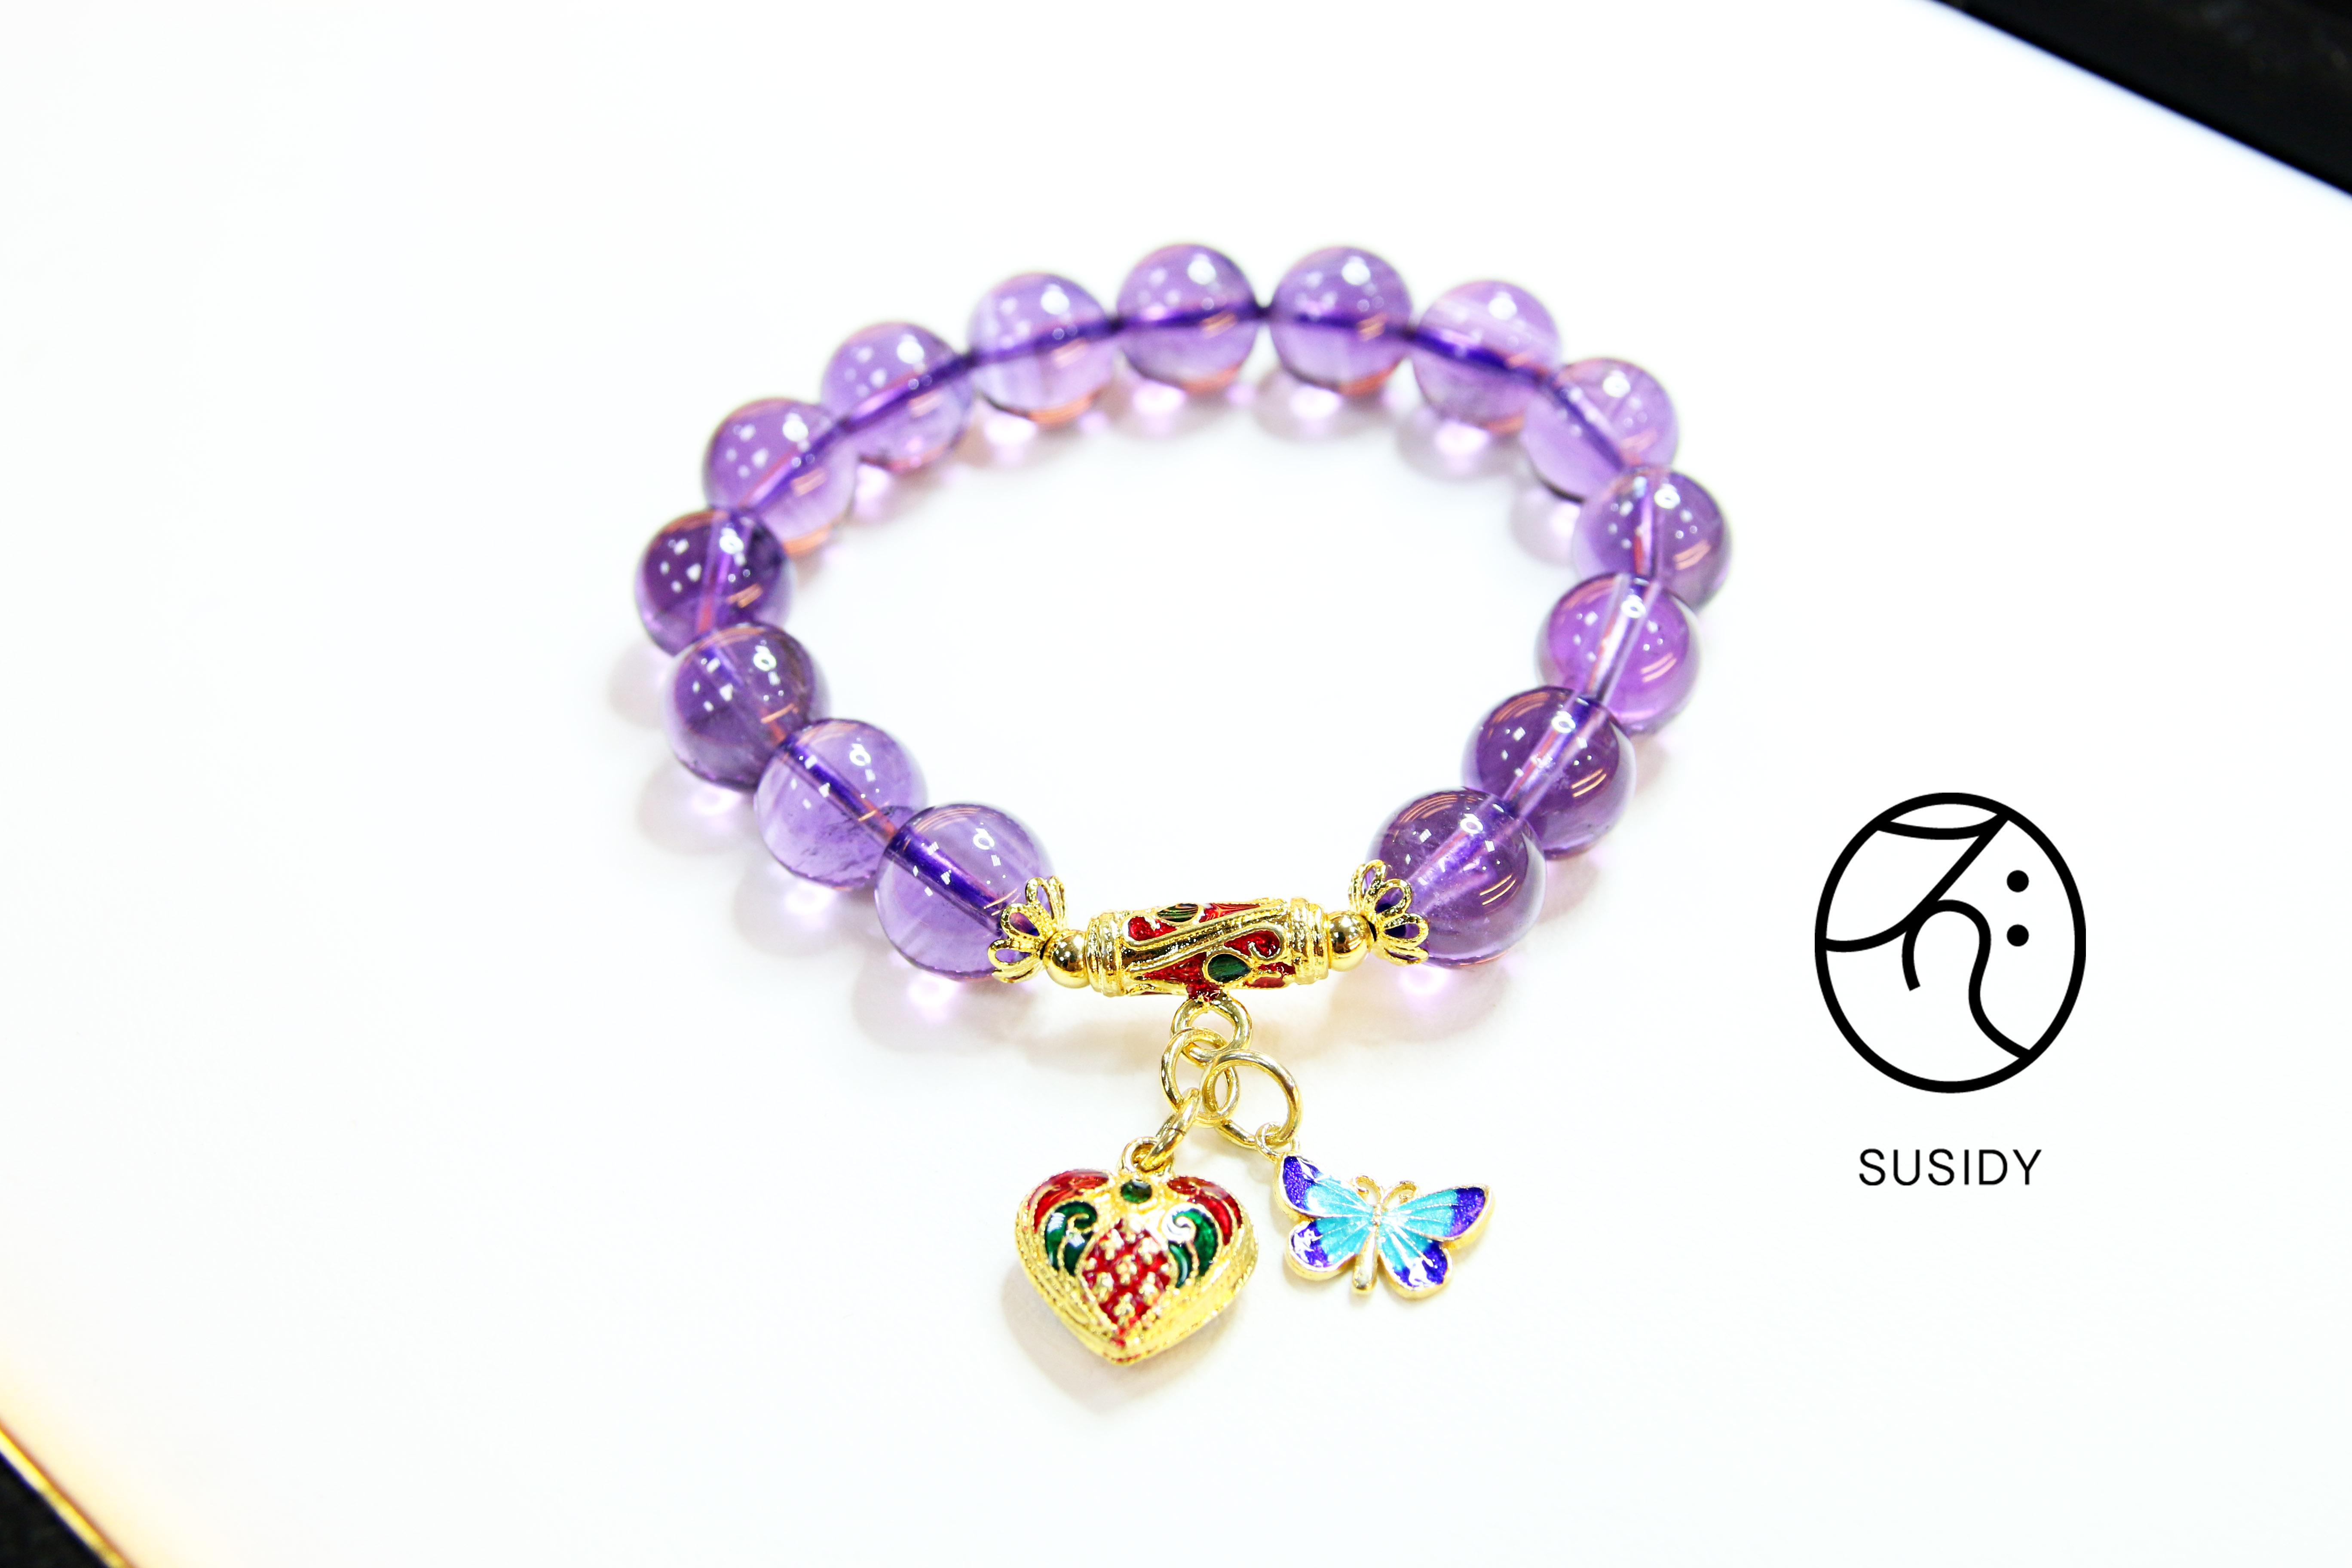 SusidyDesign -  紫骨幹水晶 手珠銀飾